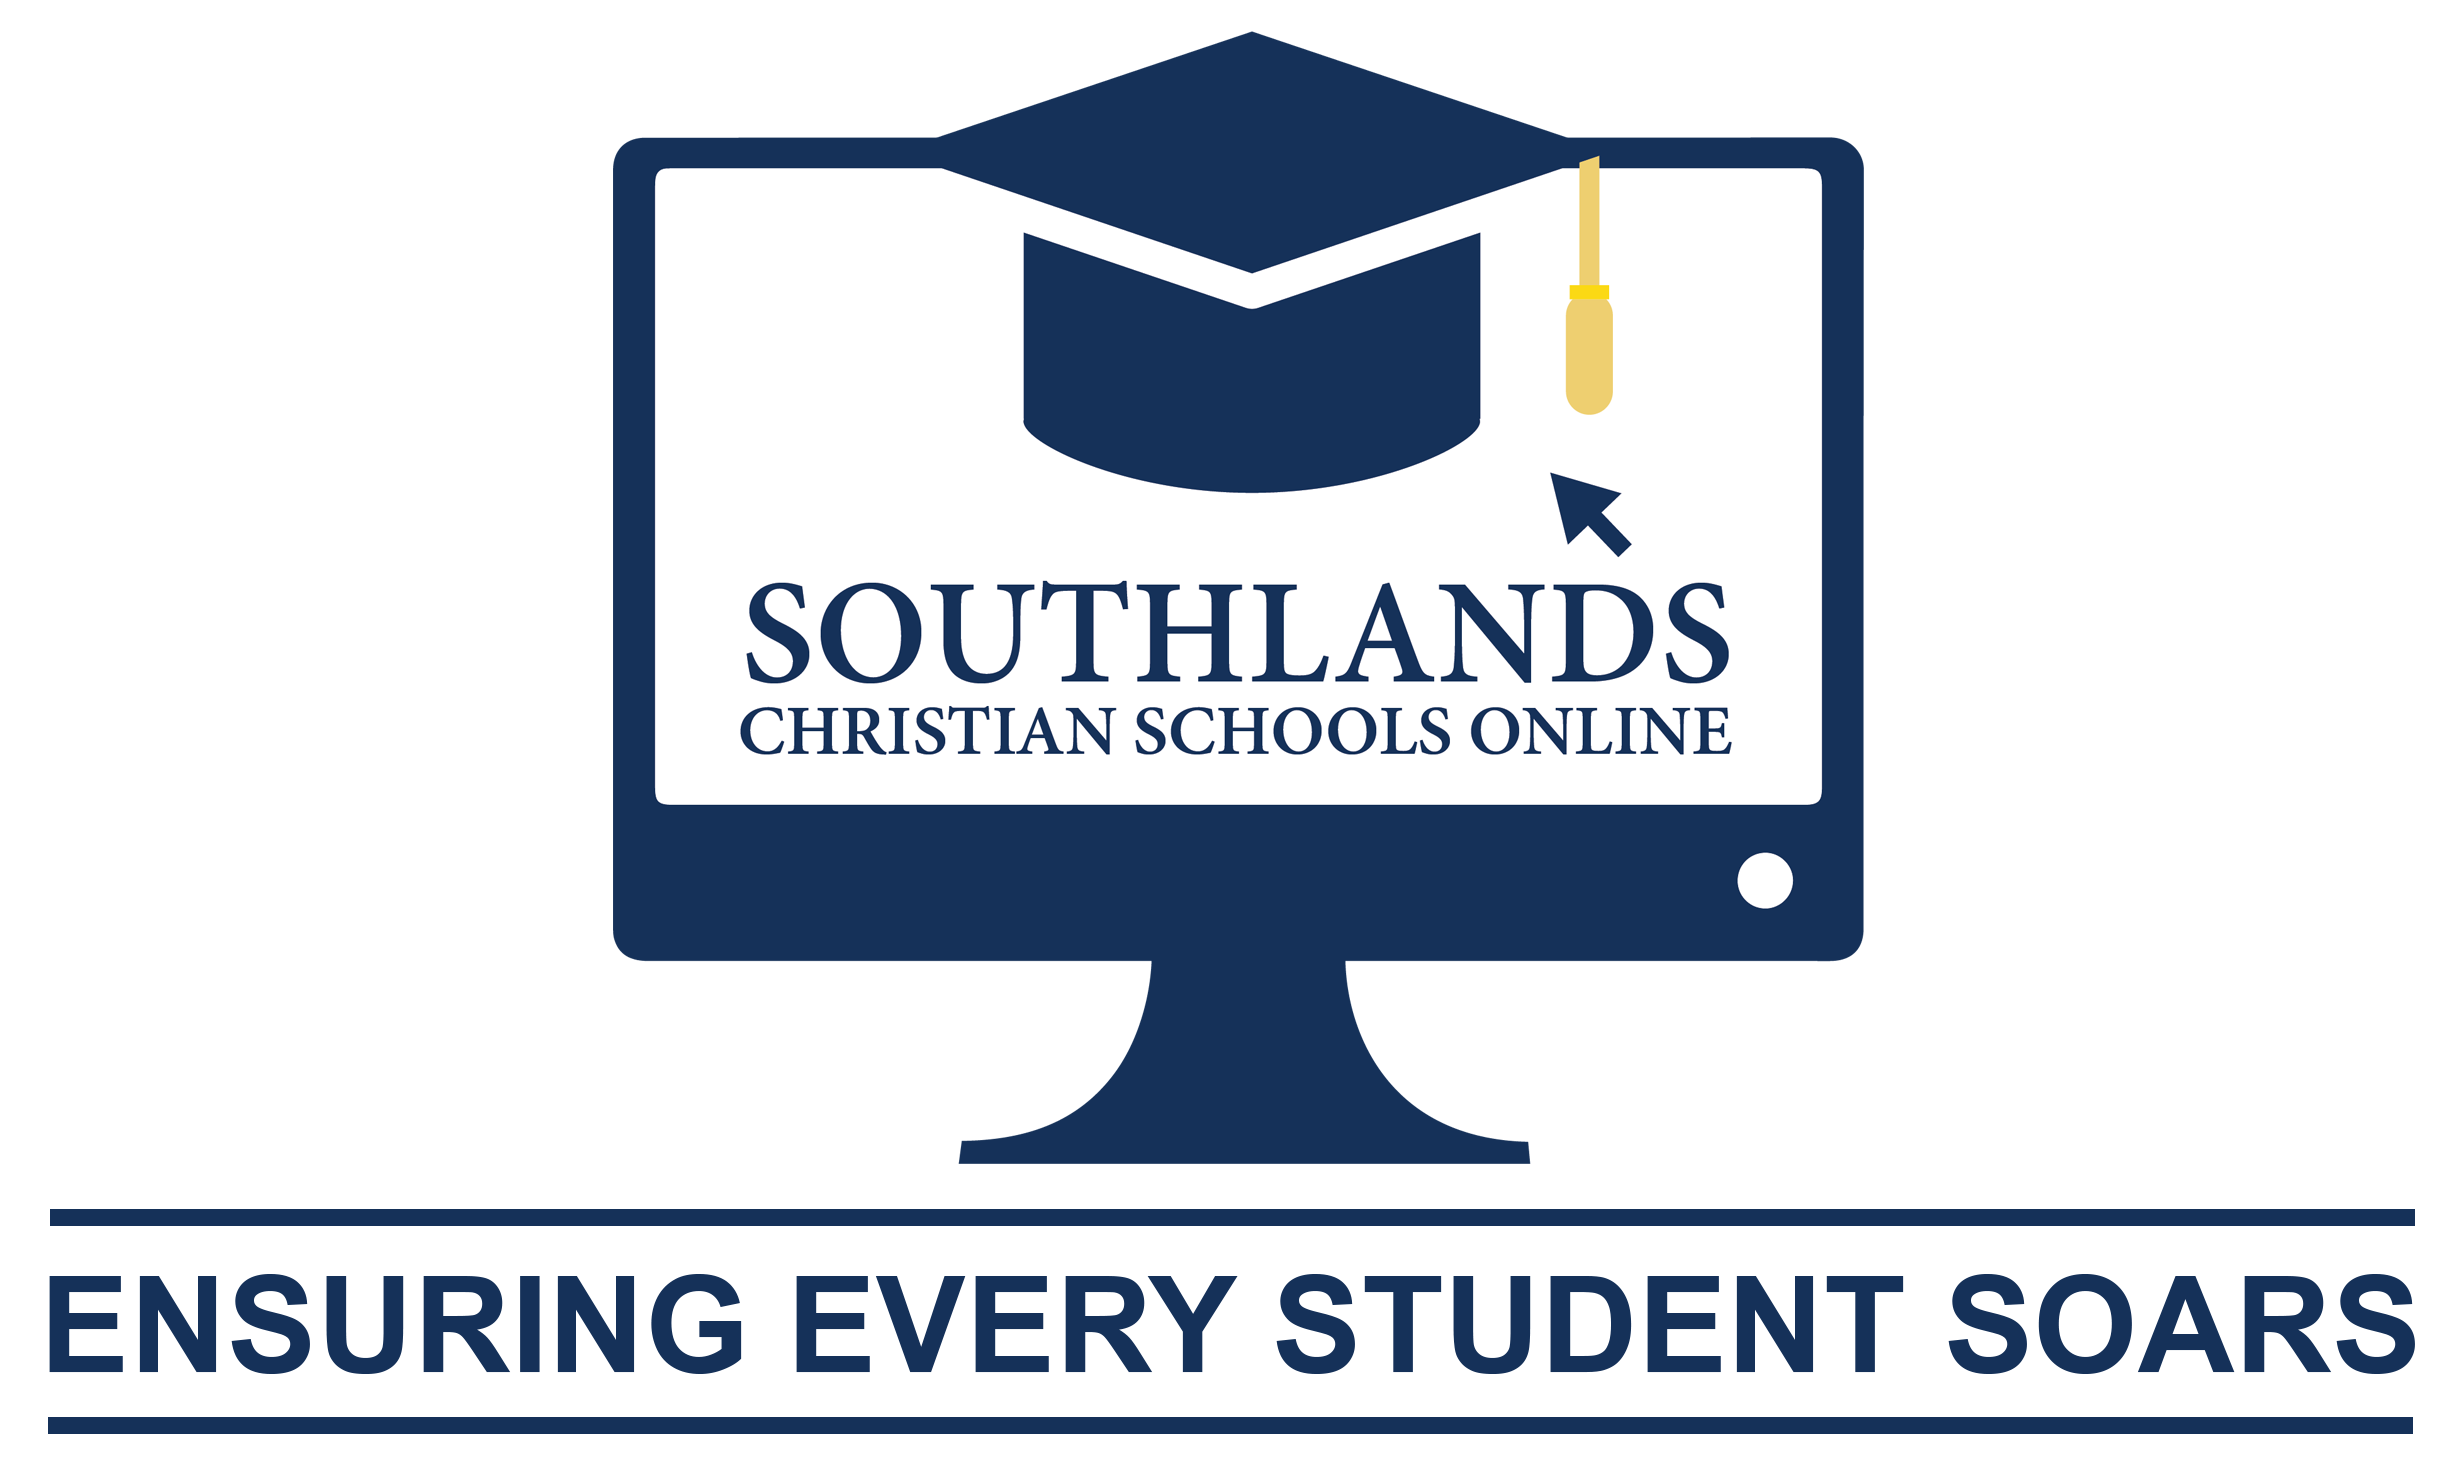 Southlands Christian Schools Online